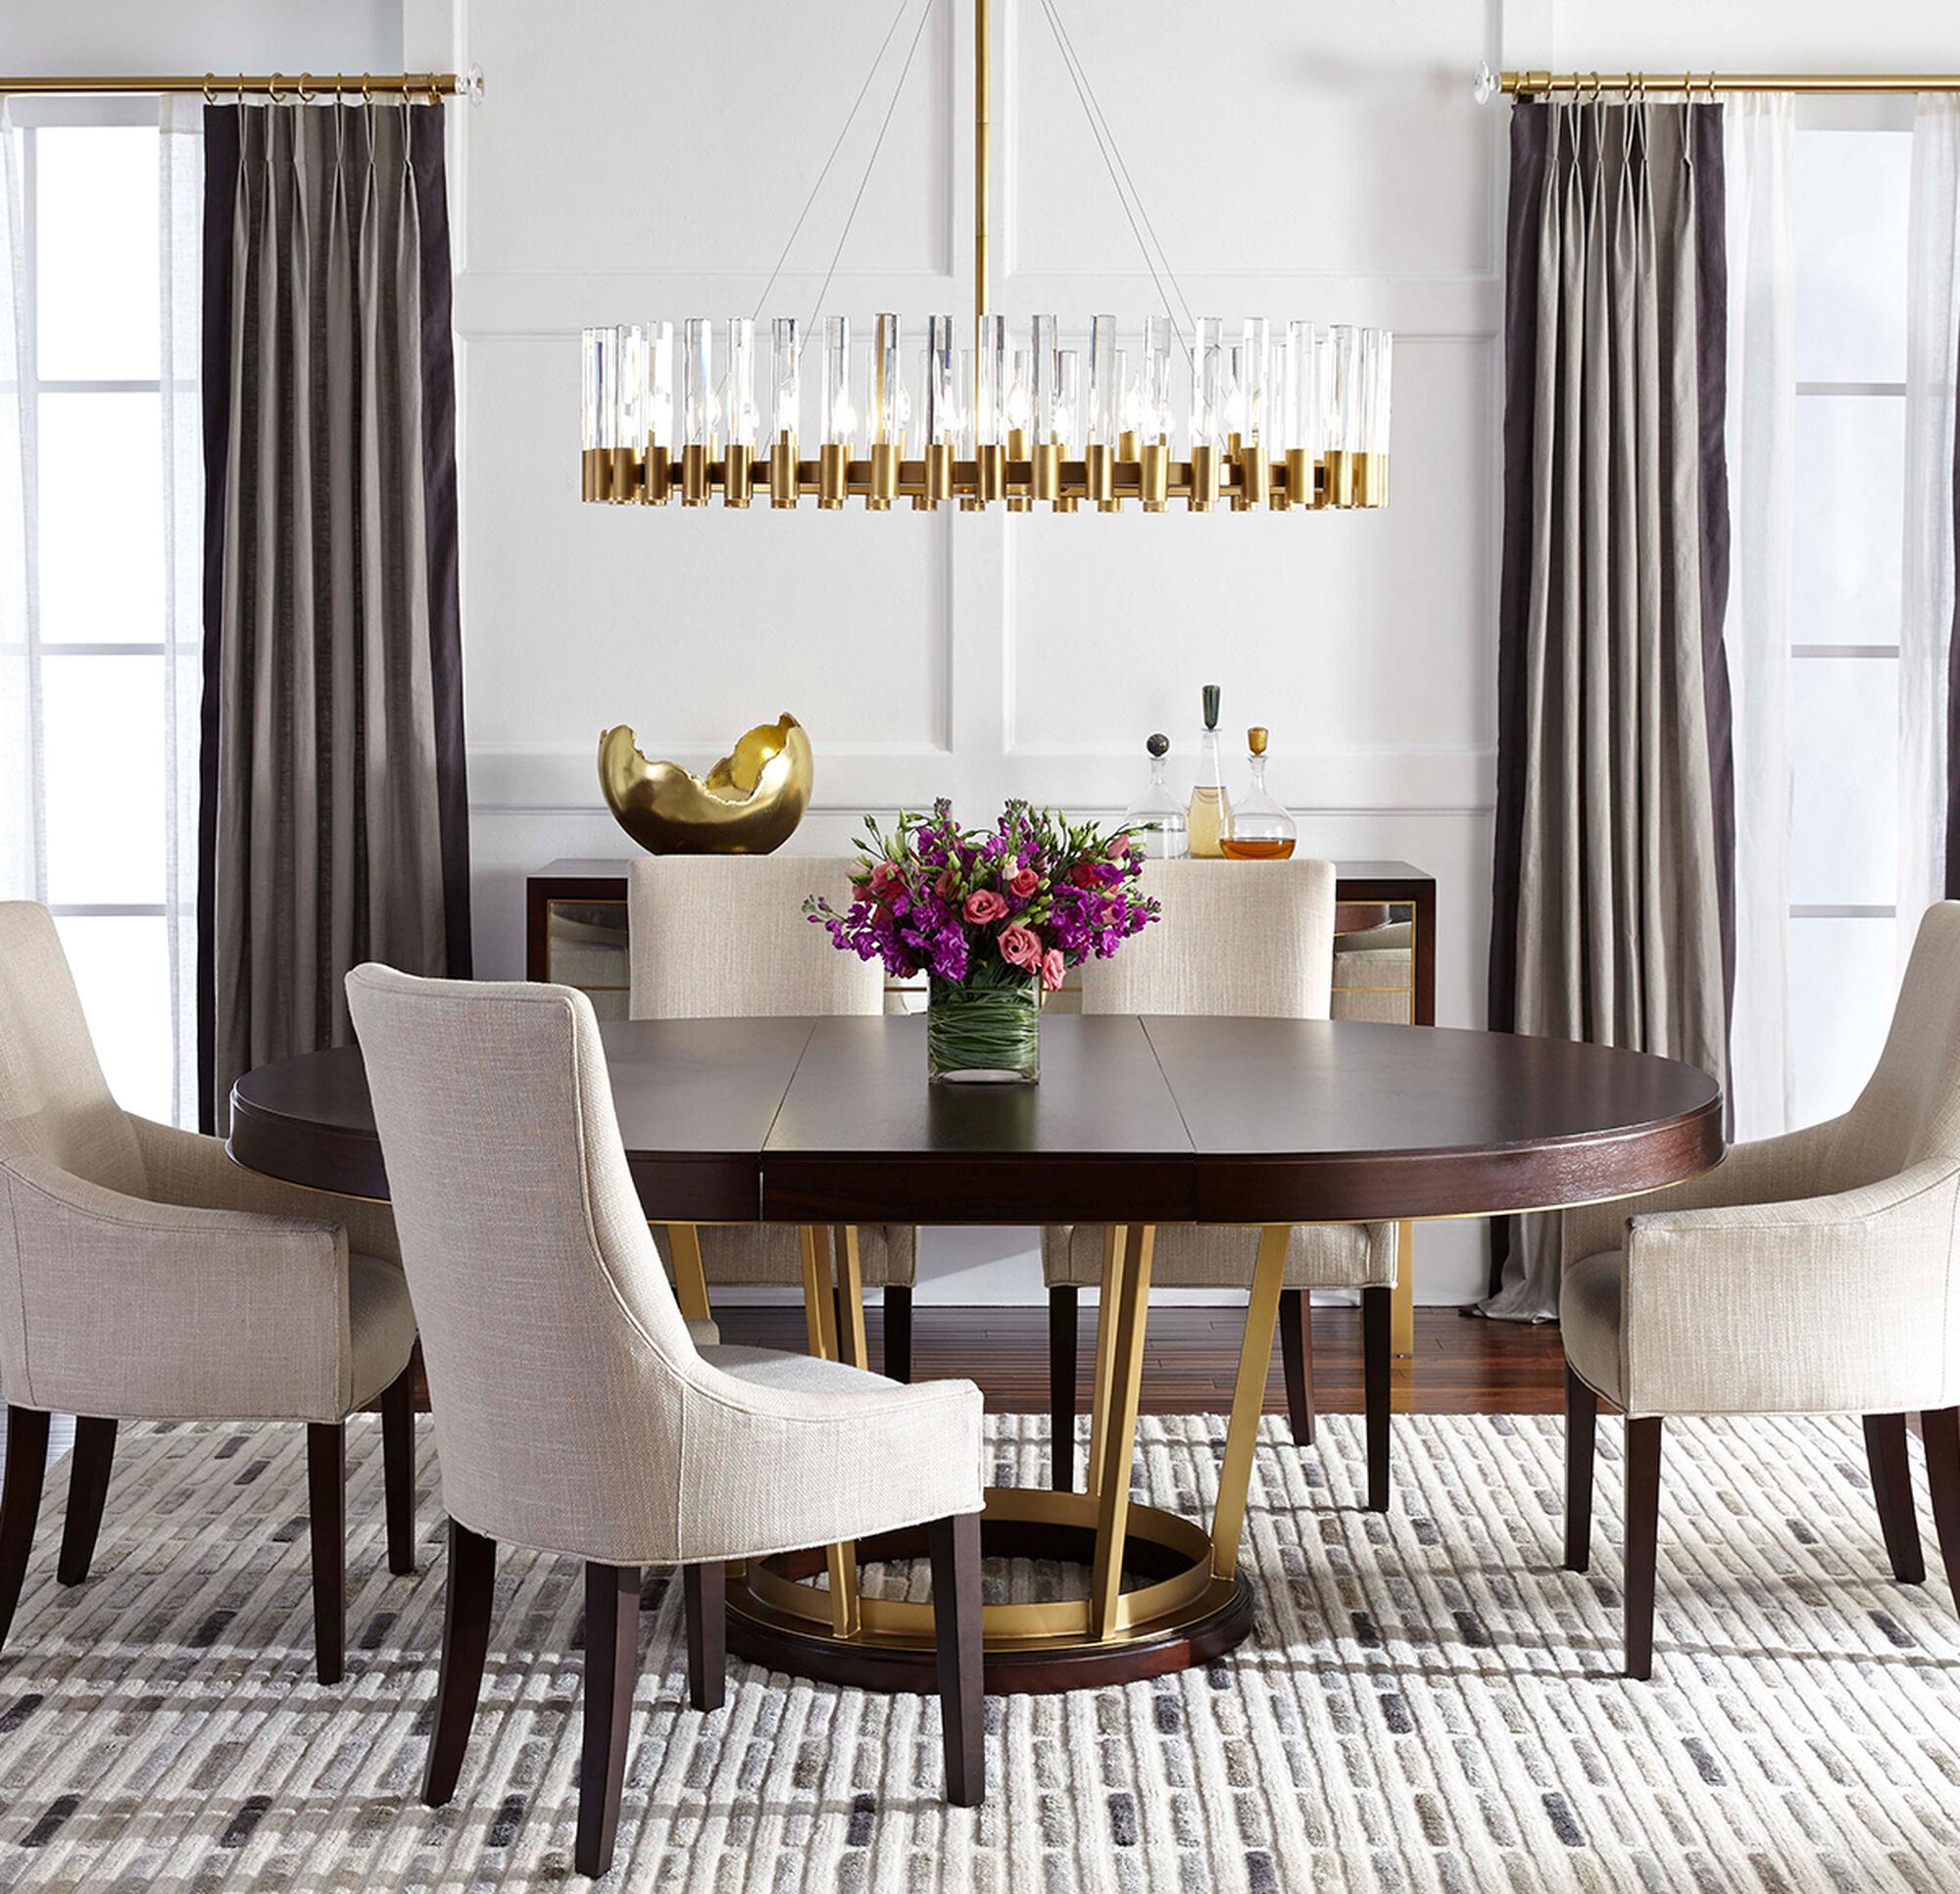 dining room chandelier brass. Dining Room Chandelier Brass D